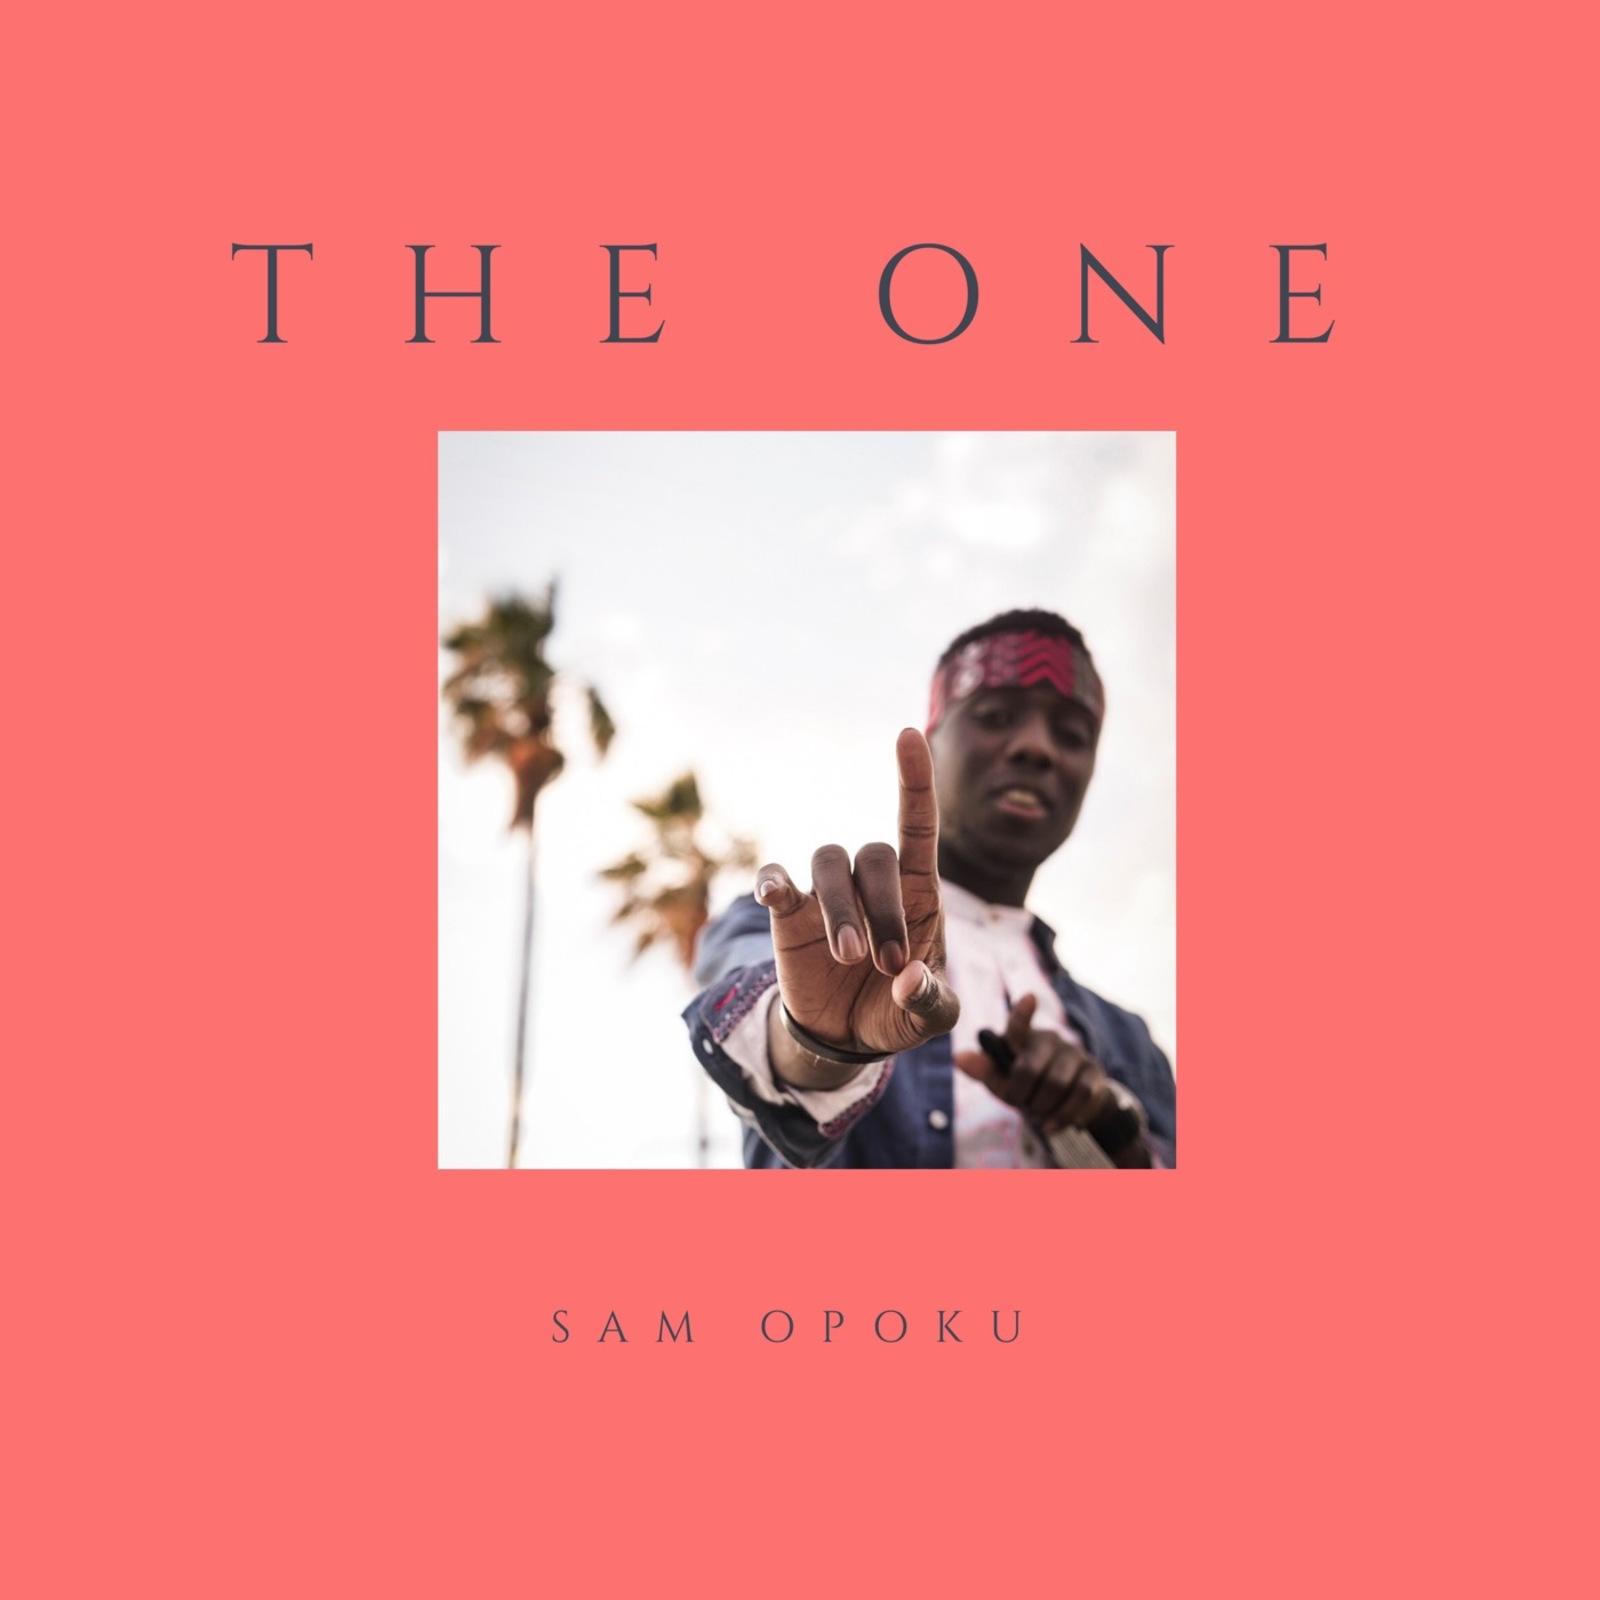 Sam Opoku - The One